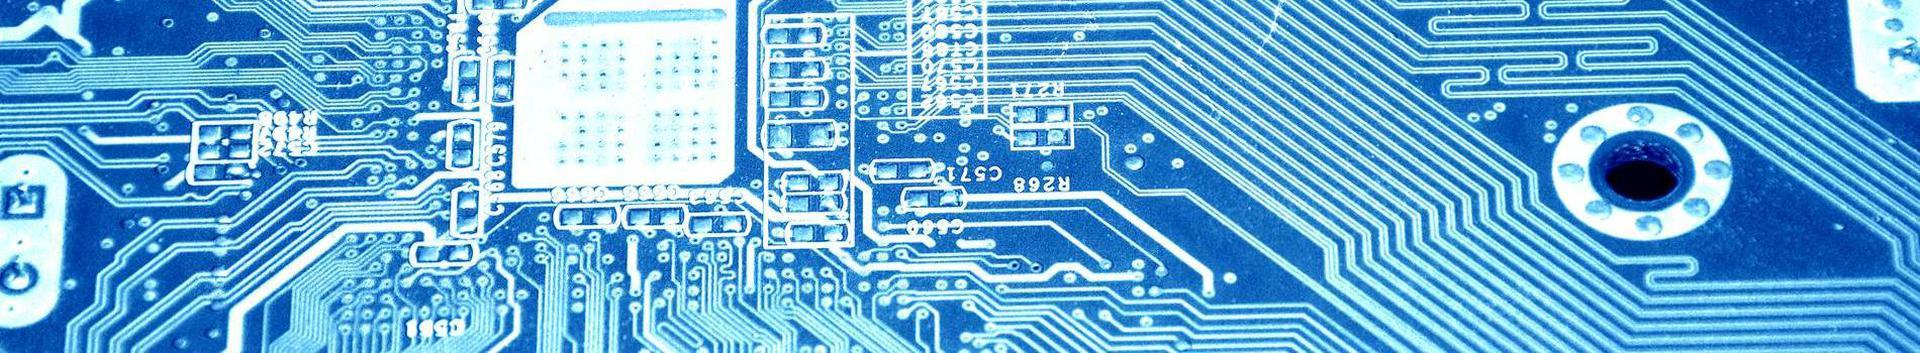 26111_elektronkomponentide-tootmine_32199508_xl.jpg